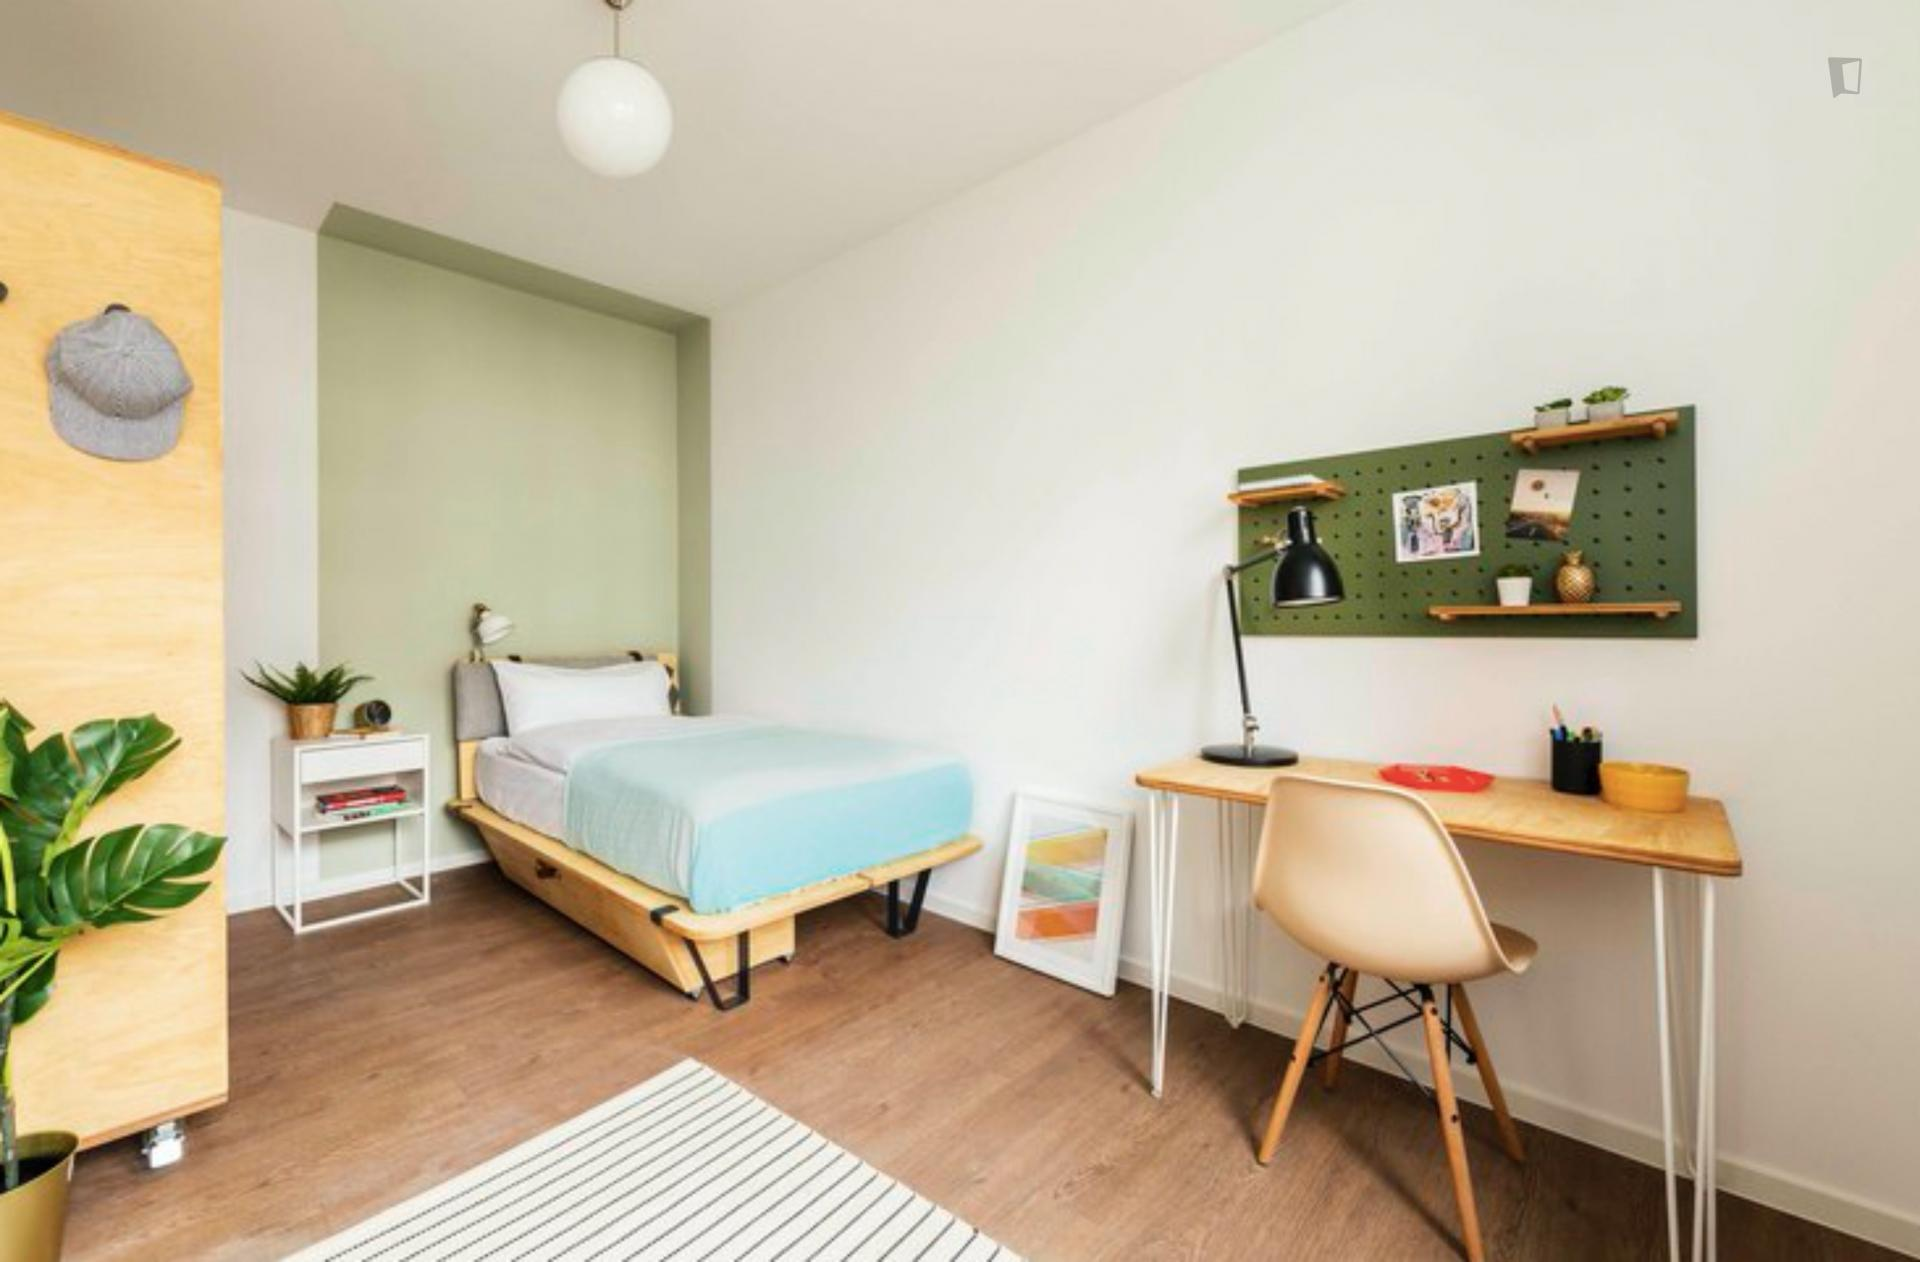 Room In 2 Bedroom Apt At Klara Franke Strasse 10 10557 Berlin Germany 17188116 Rentberry